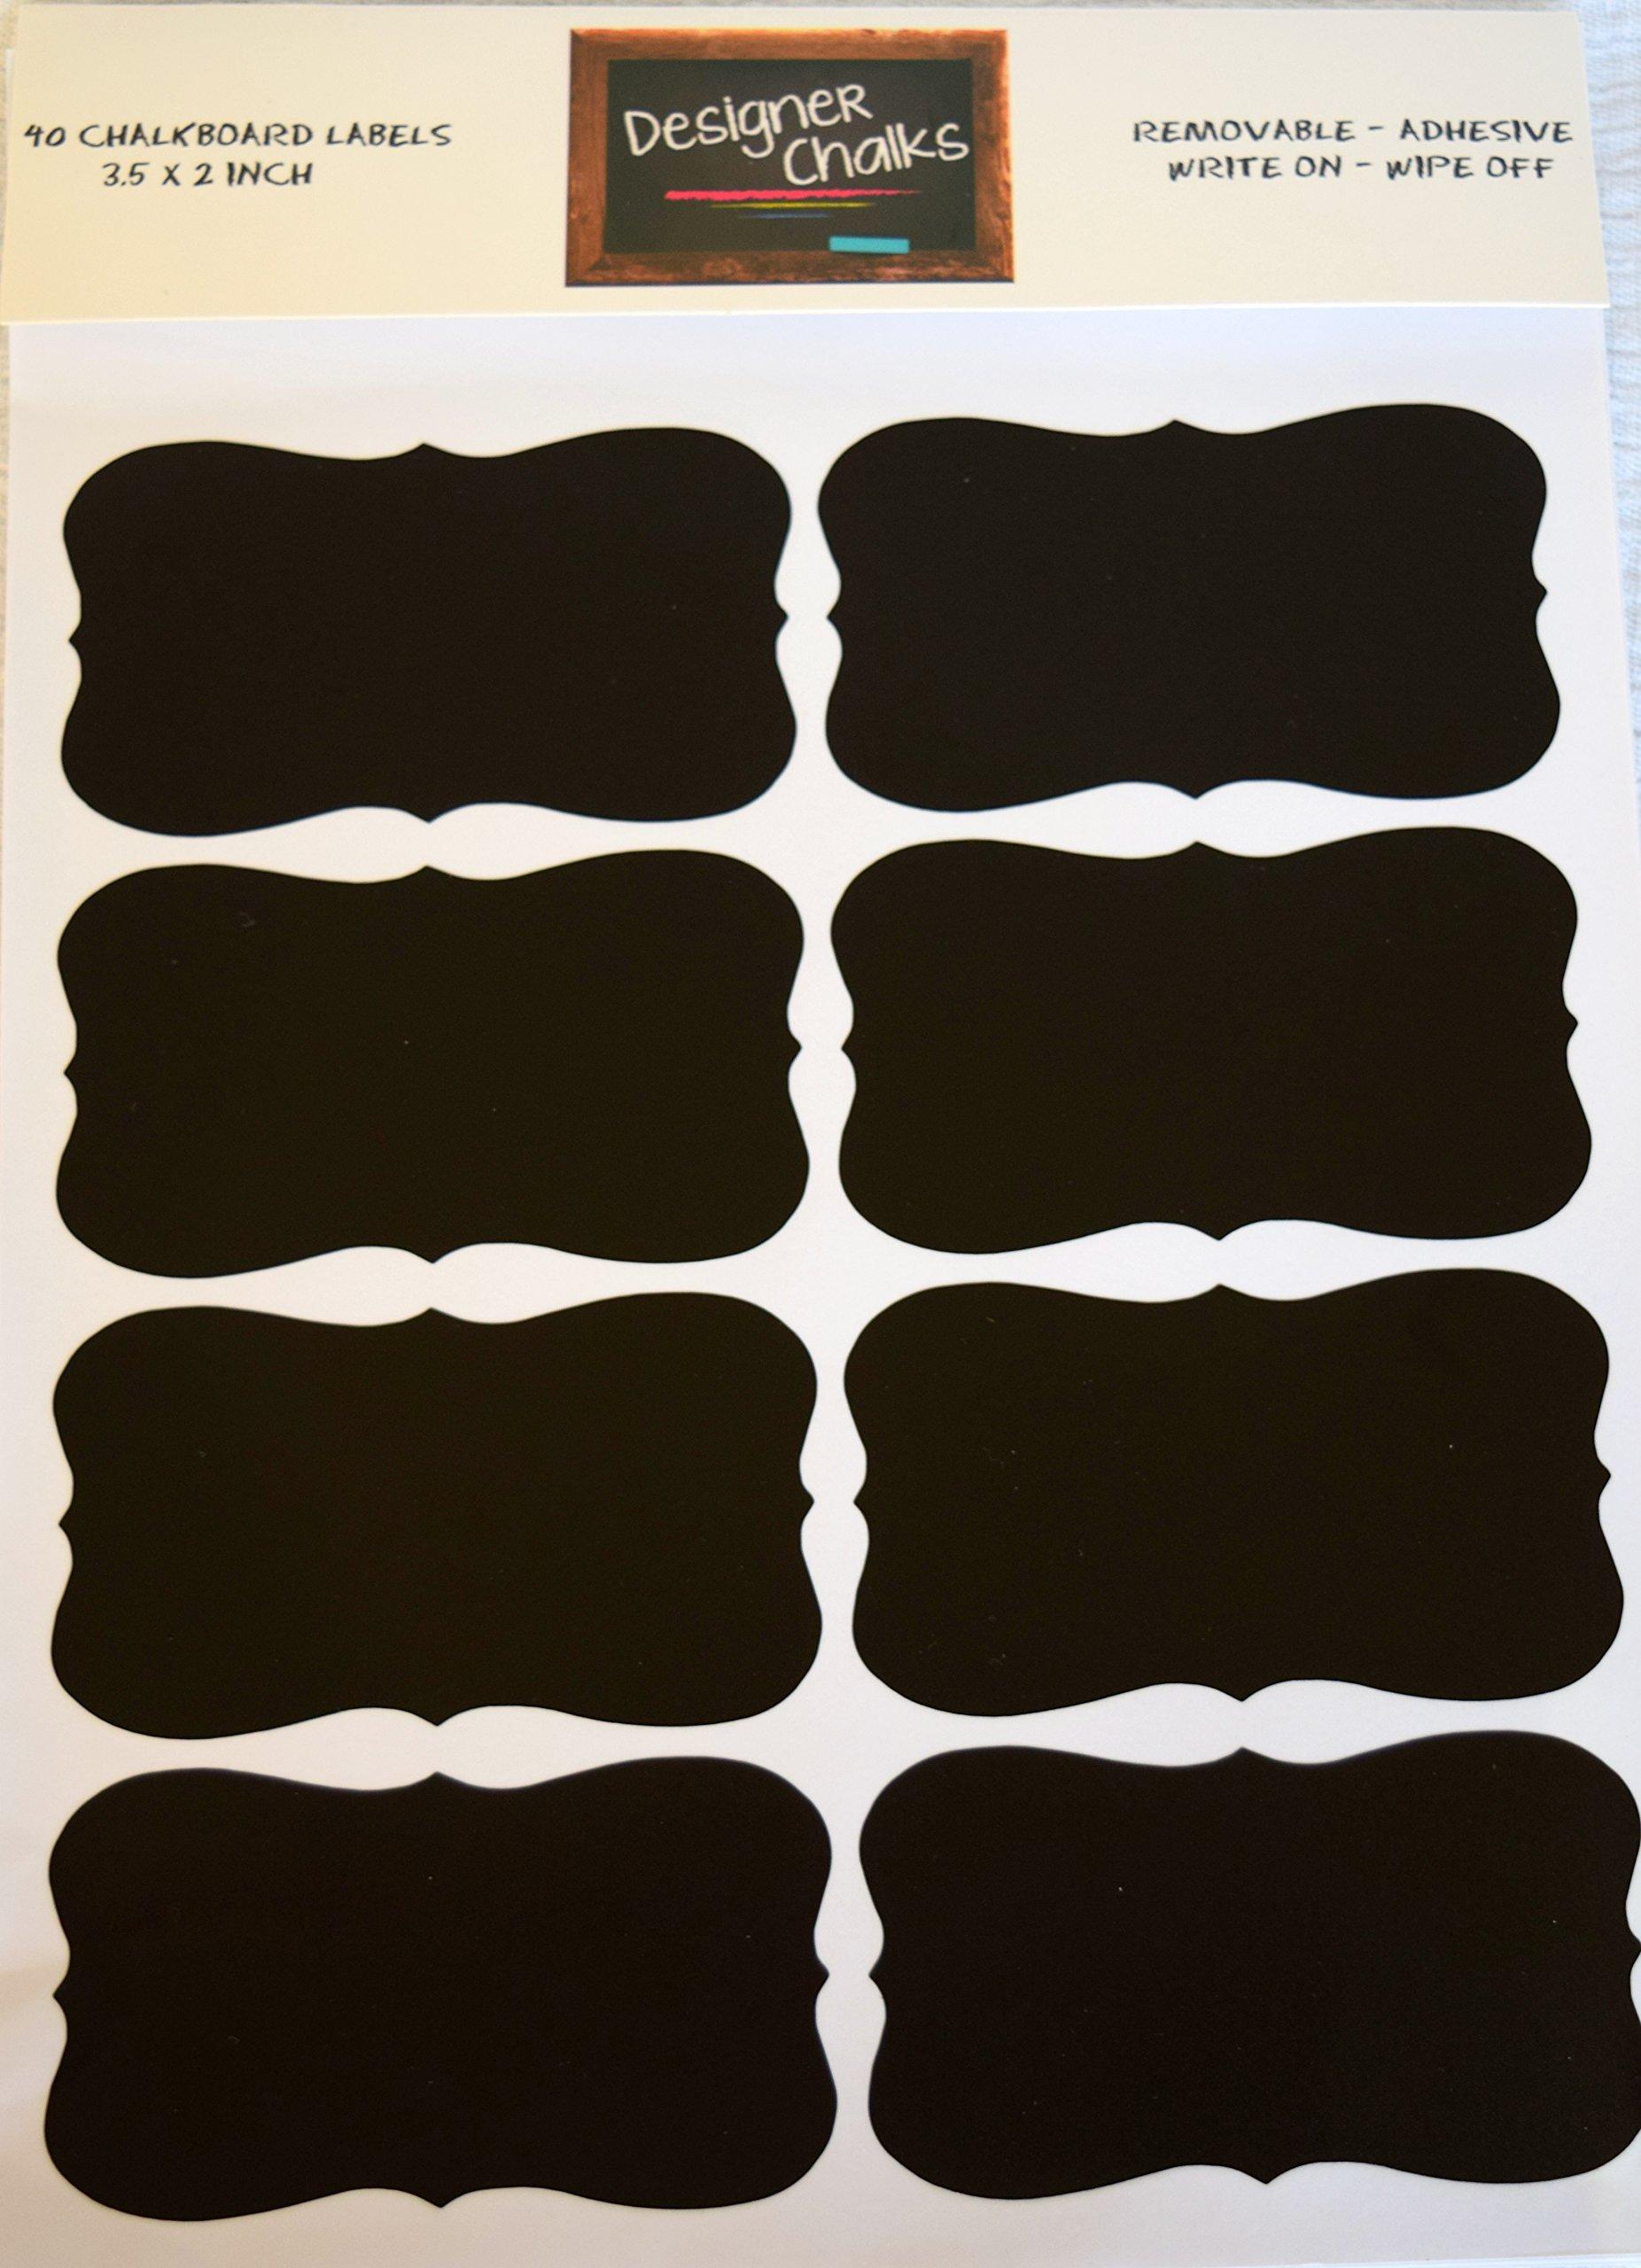 Designer Chalks Premium Chalkboard Adhesive Vinyl Labels Large Set of 40 3.5 X 2 inch Chalk Label Stickers Organization